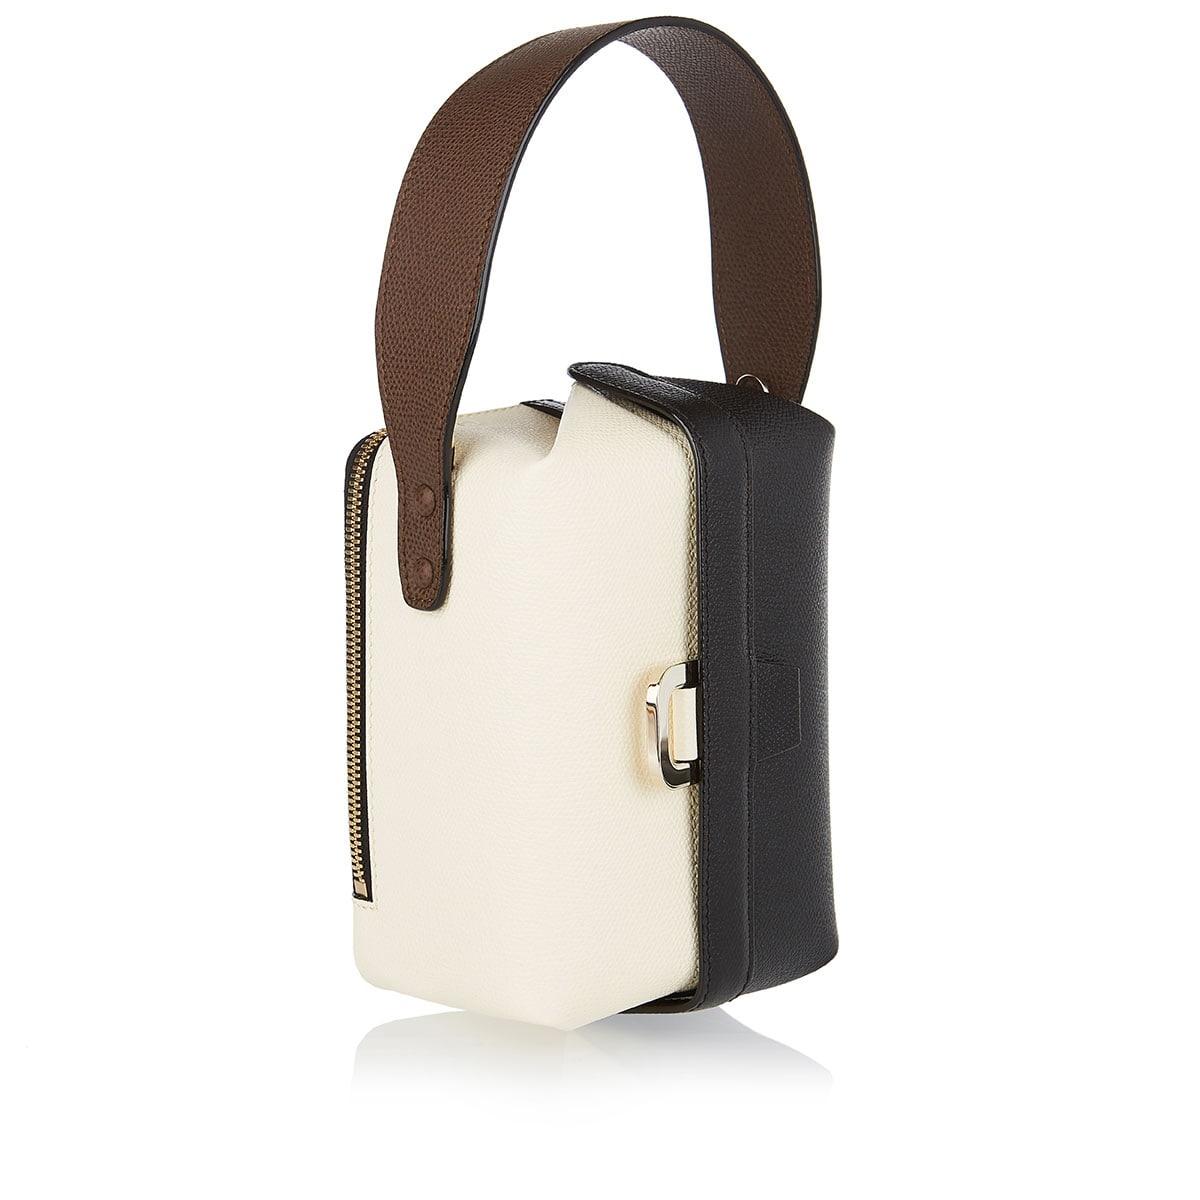 Tric Trac two-tone bucket bag